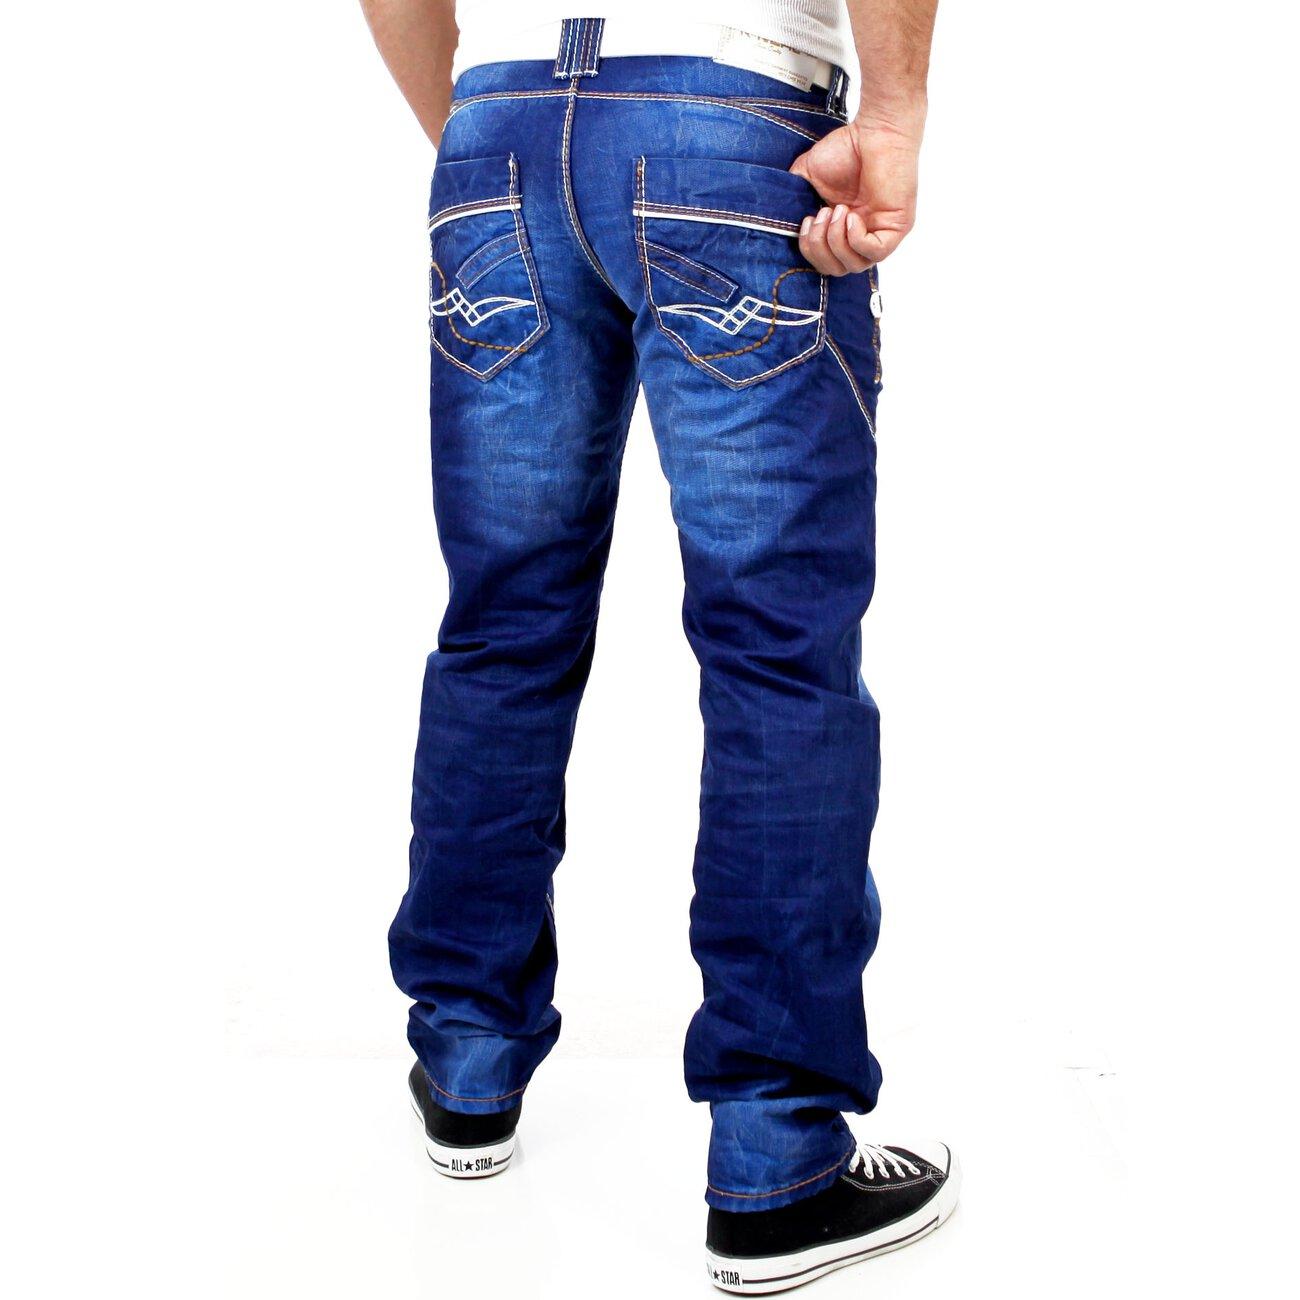 r neal herren used look dicke naht jeans hose rn 8442 25. Black Bedroom Furniture Sets. Home Design Ideas